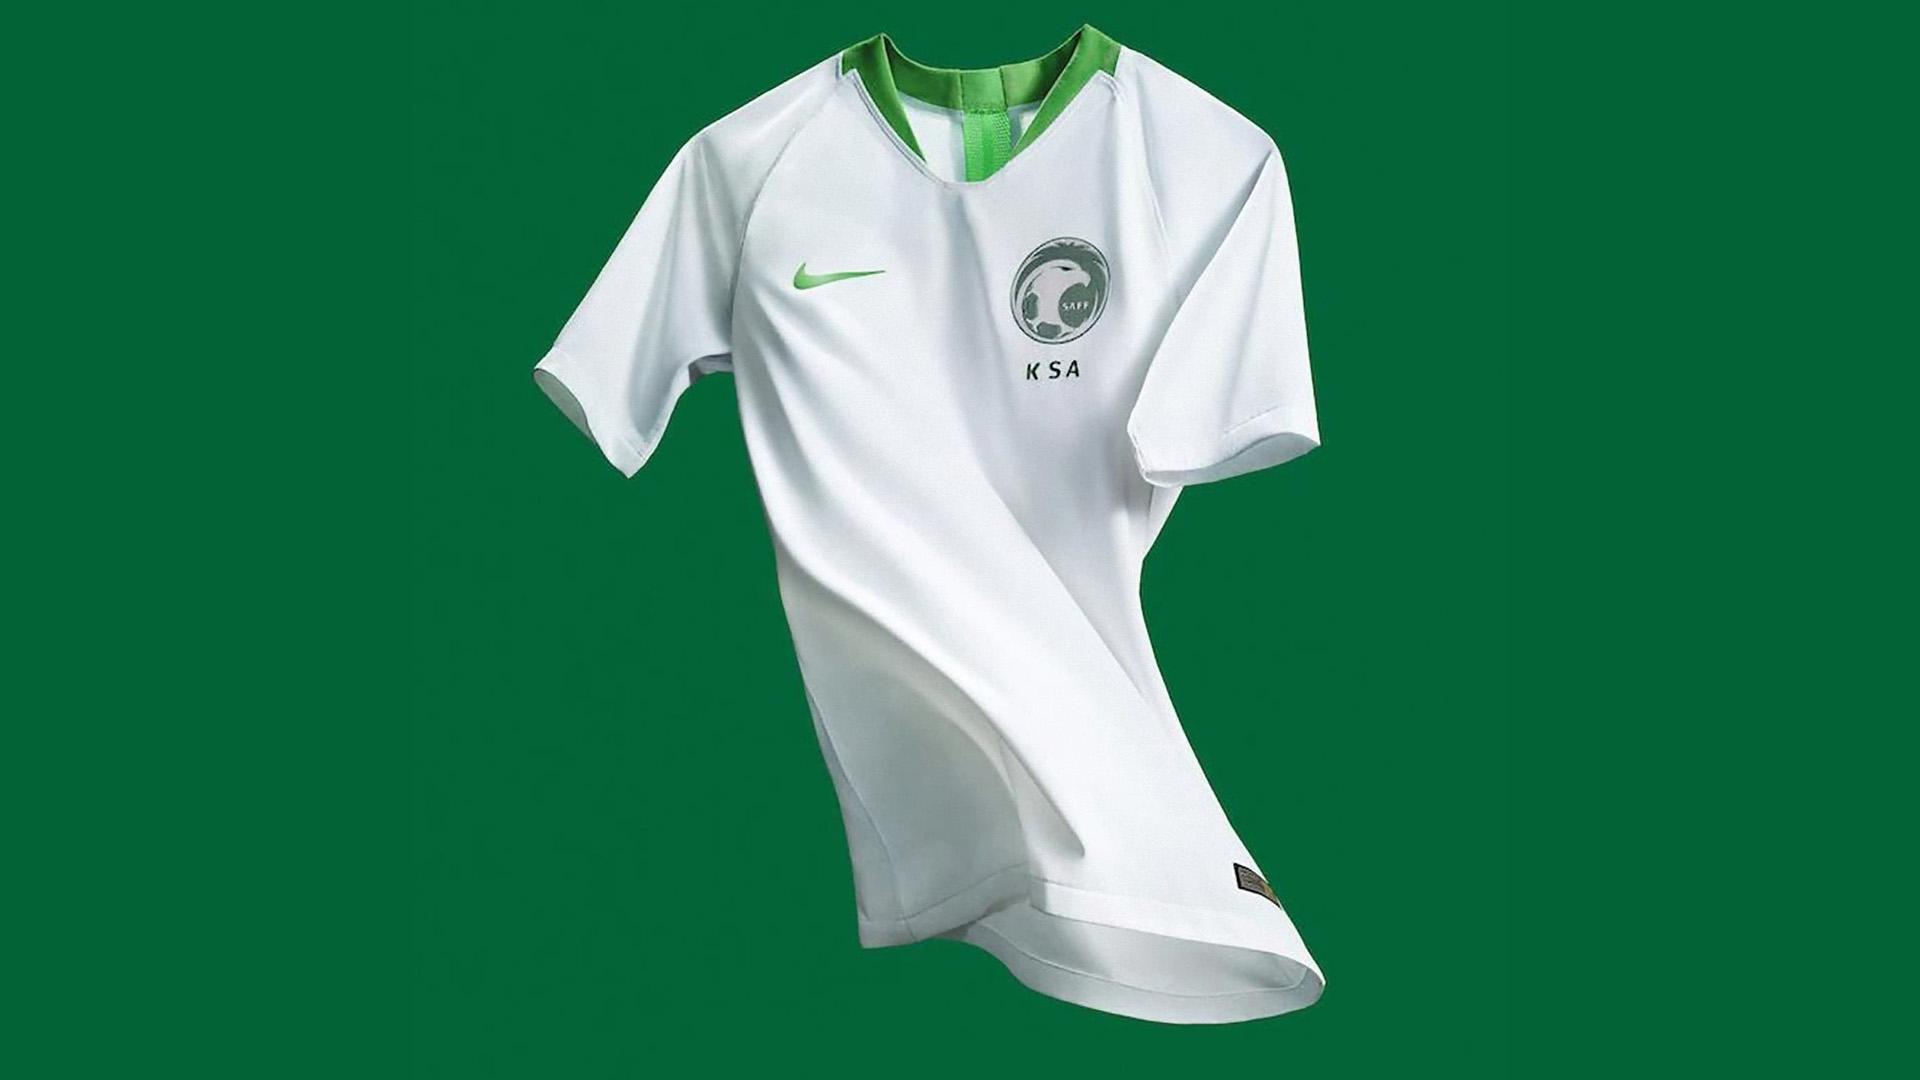 Arabia Saudita Camiseta Titular Saudi Arabia Home Kit 2018